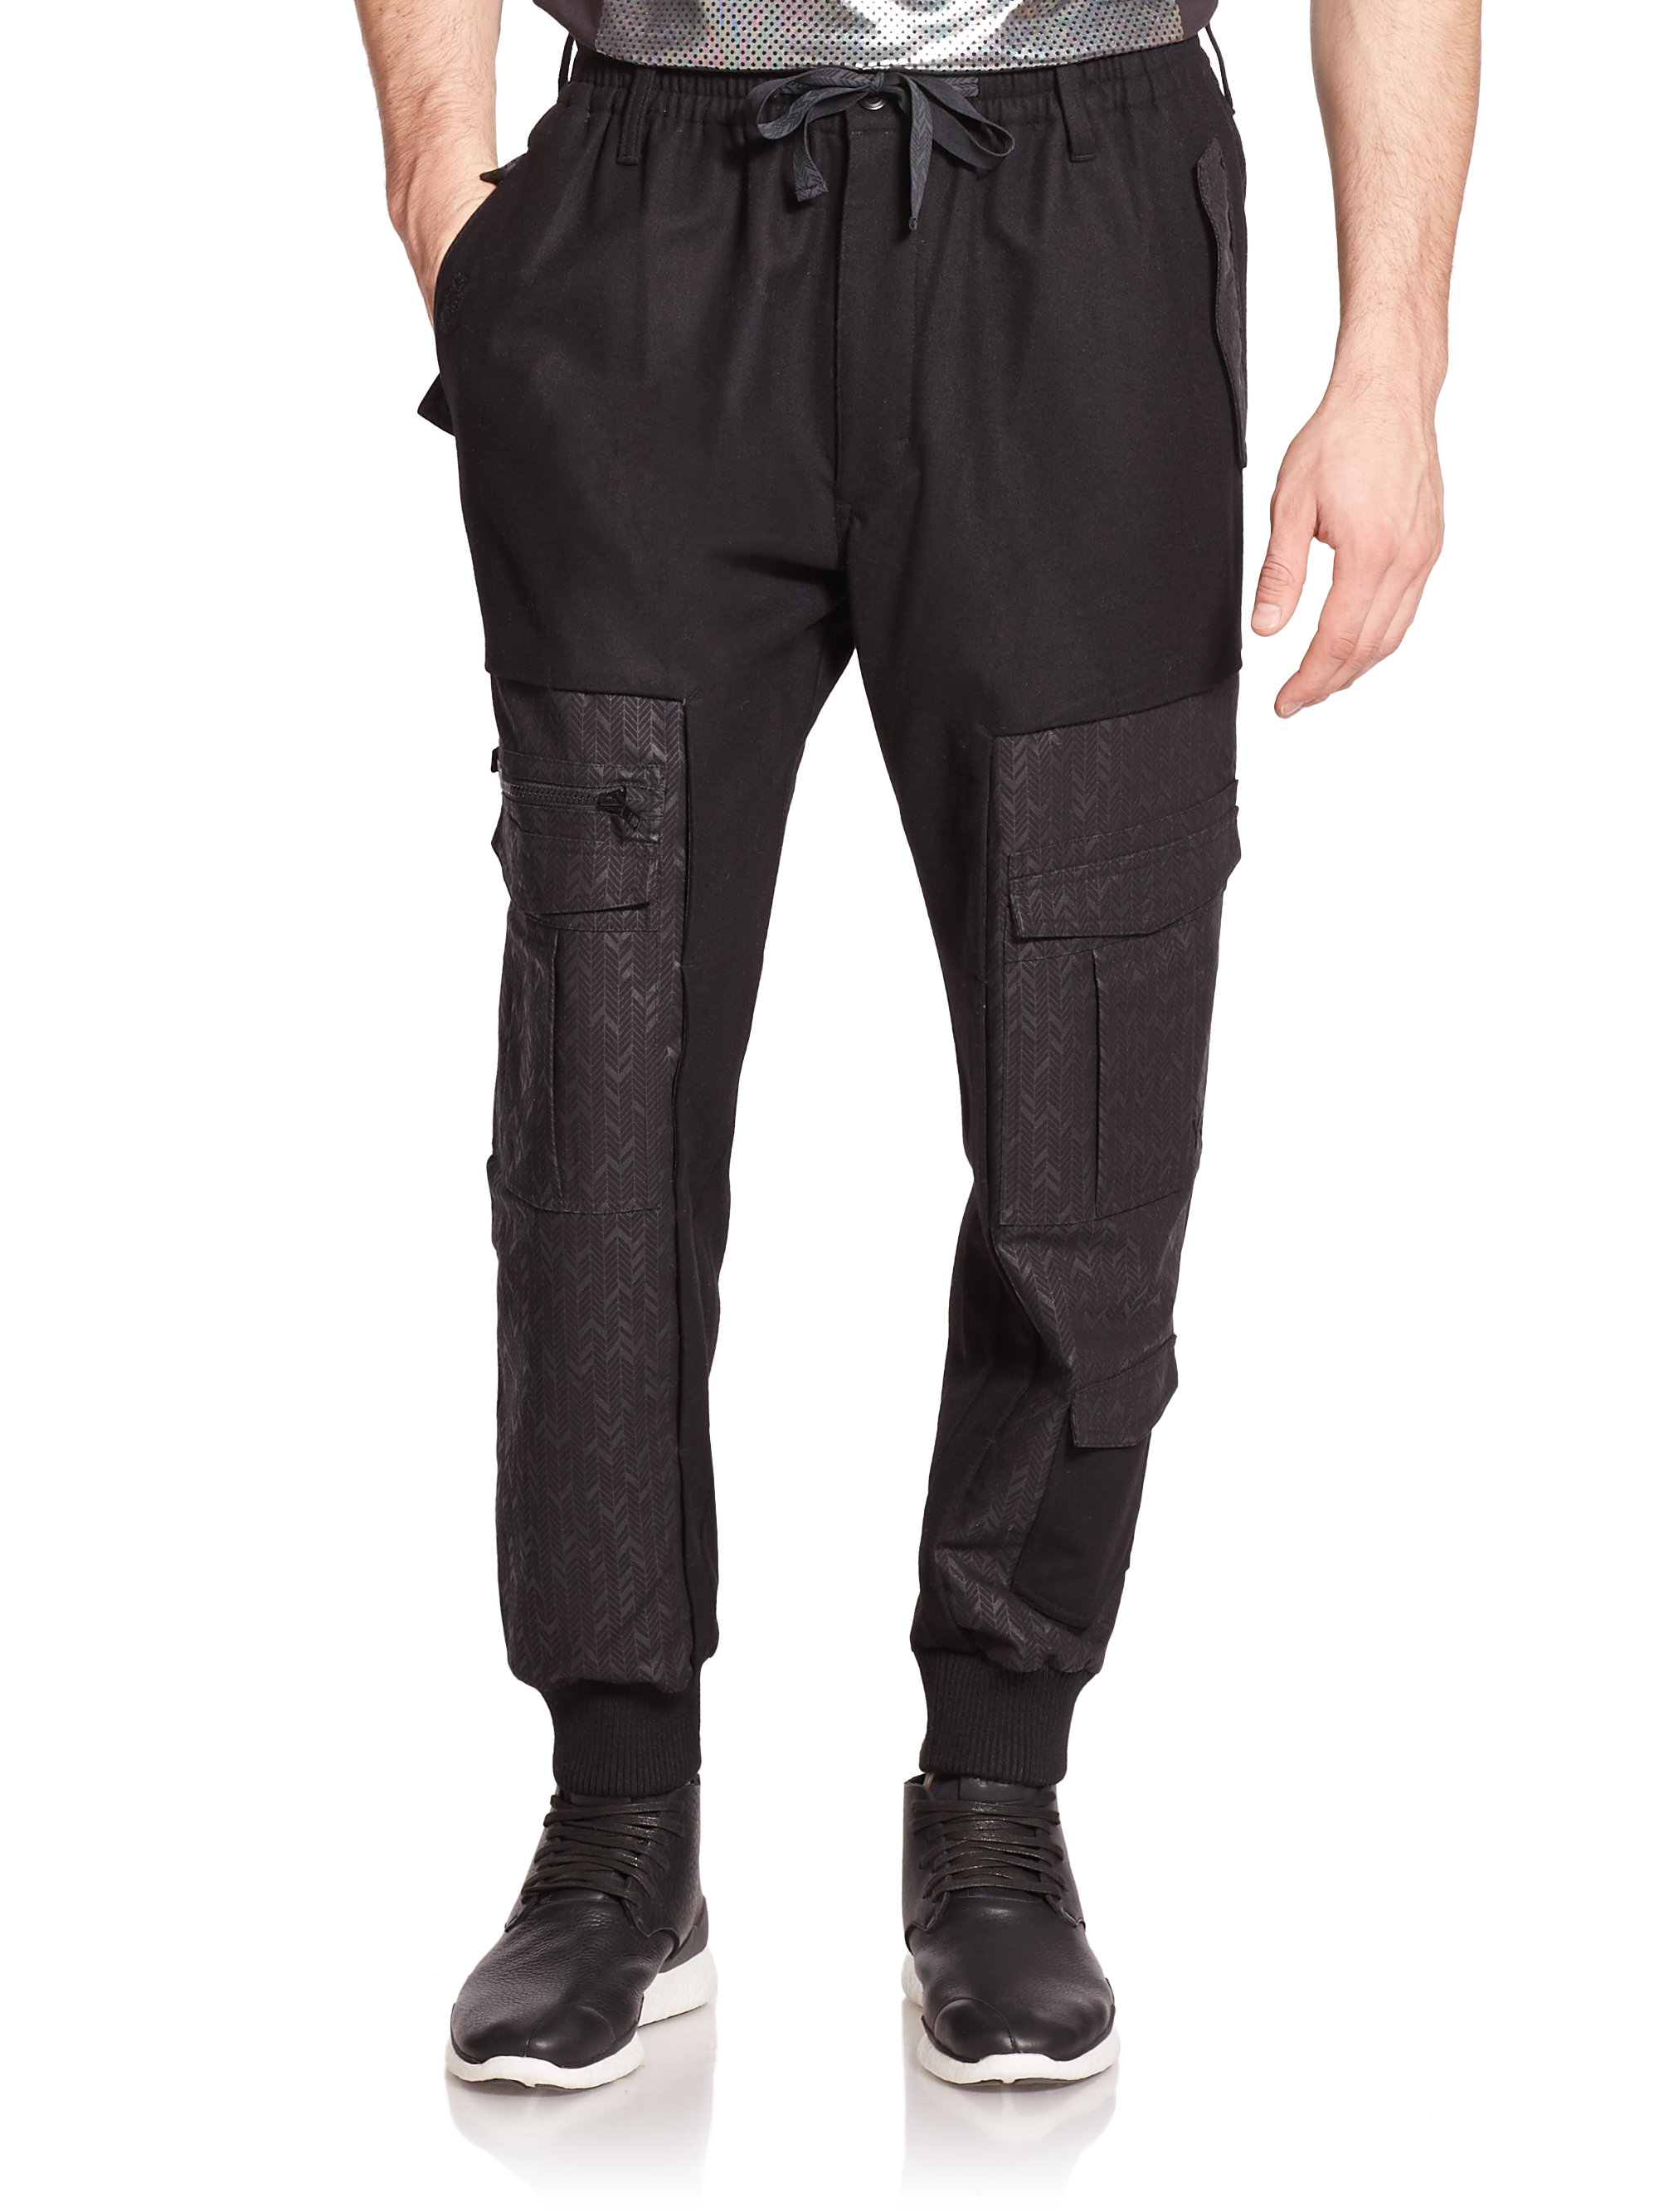 Y-3 Sherpa Track Pants in Black for Men